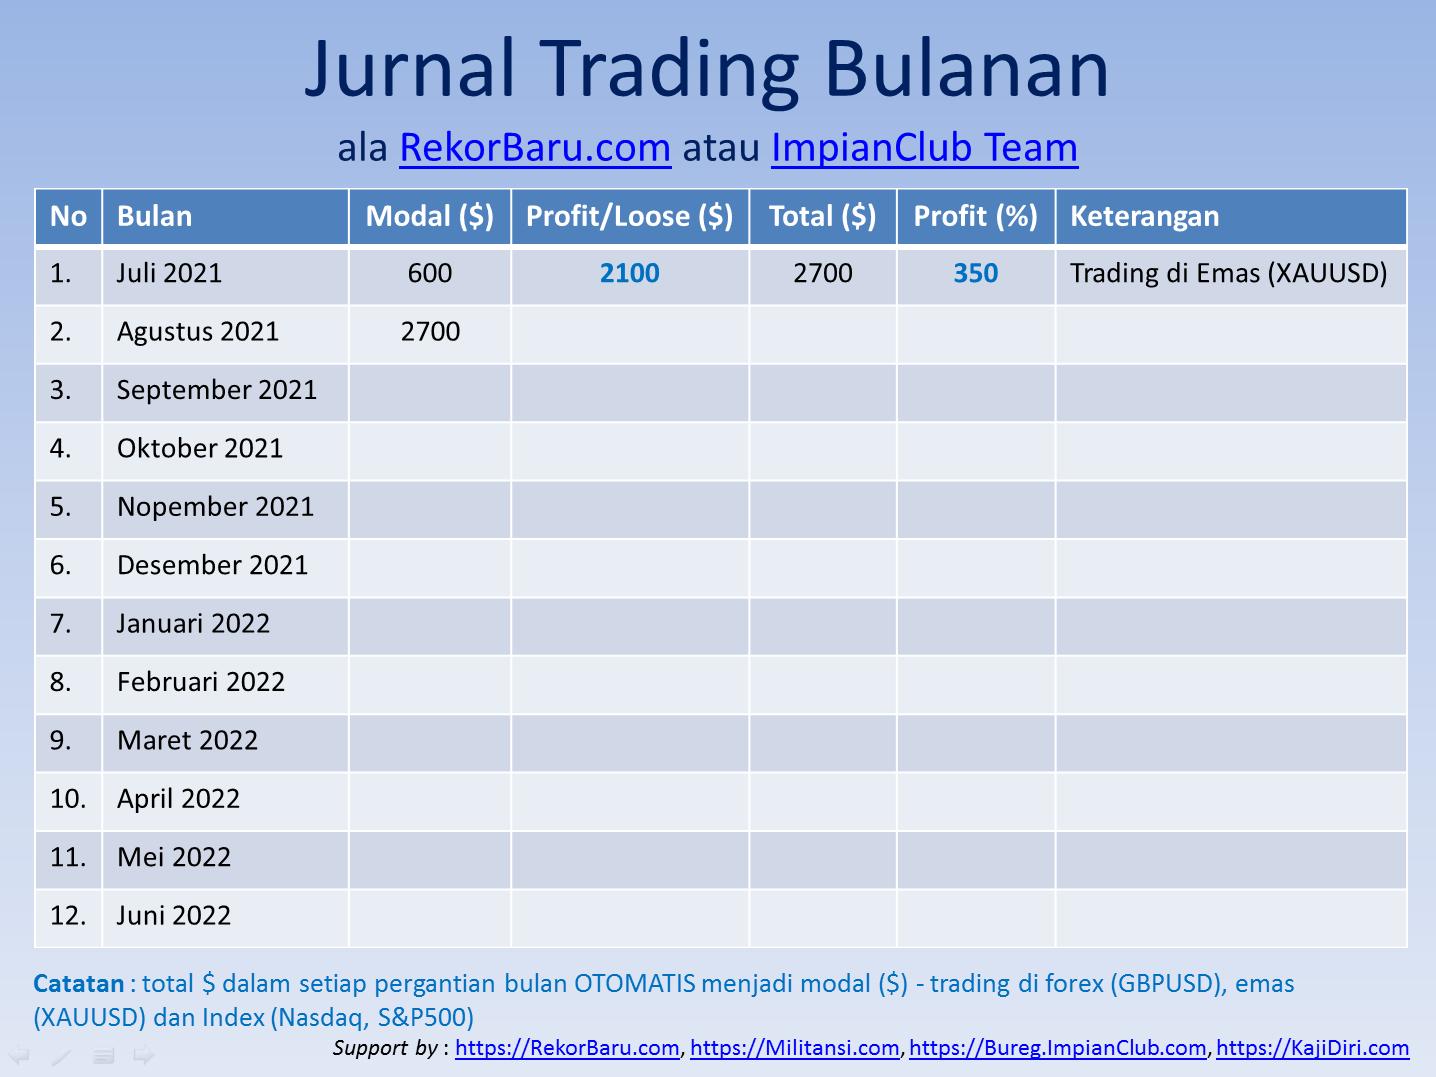 Rekapitulasi Jurnal Trading Bulanan ala RekorBaruDotCom atau ImpianClub Team ver 21.7.1